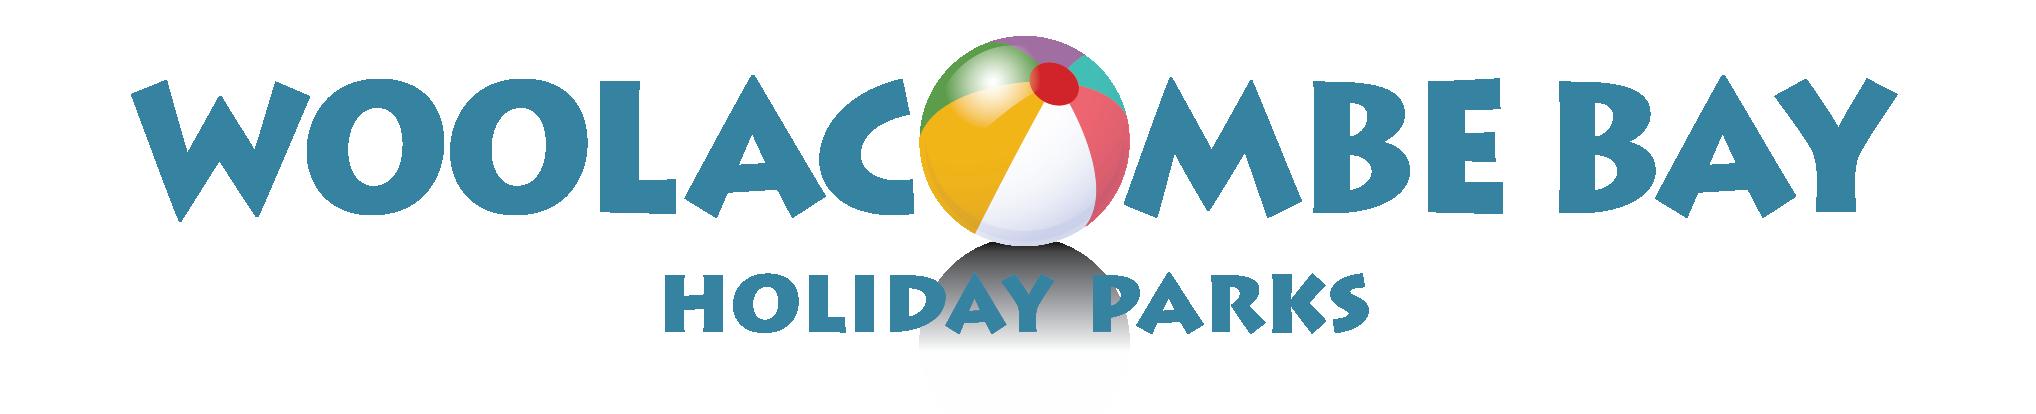 Read Woolacombe Bay Holiday Parks Reviews